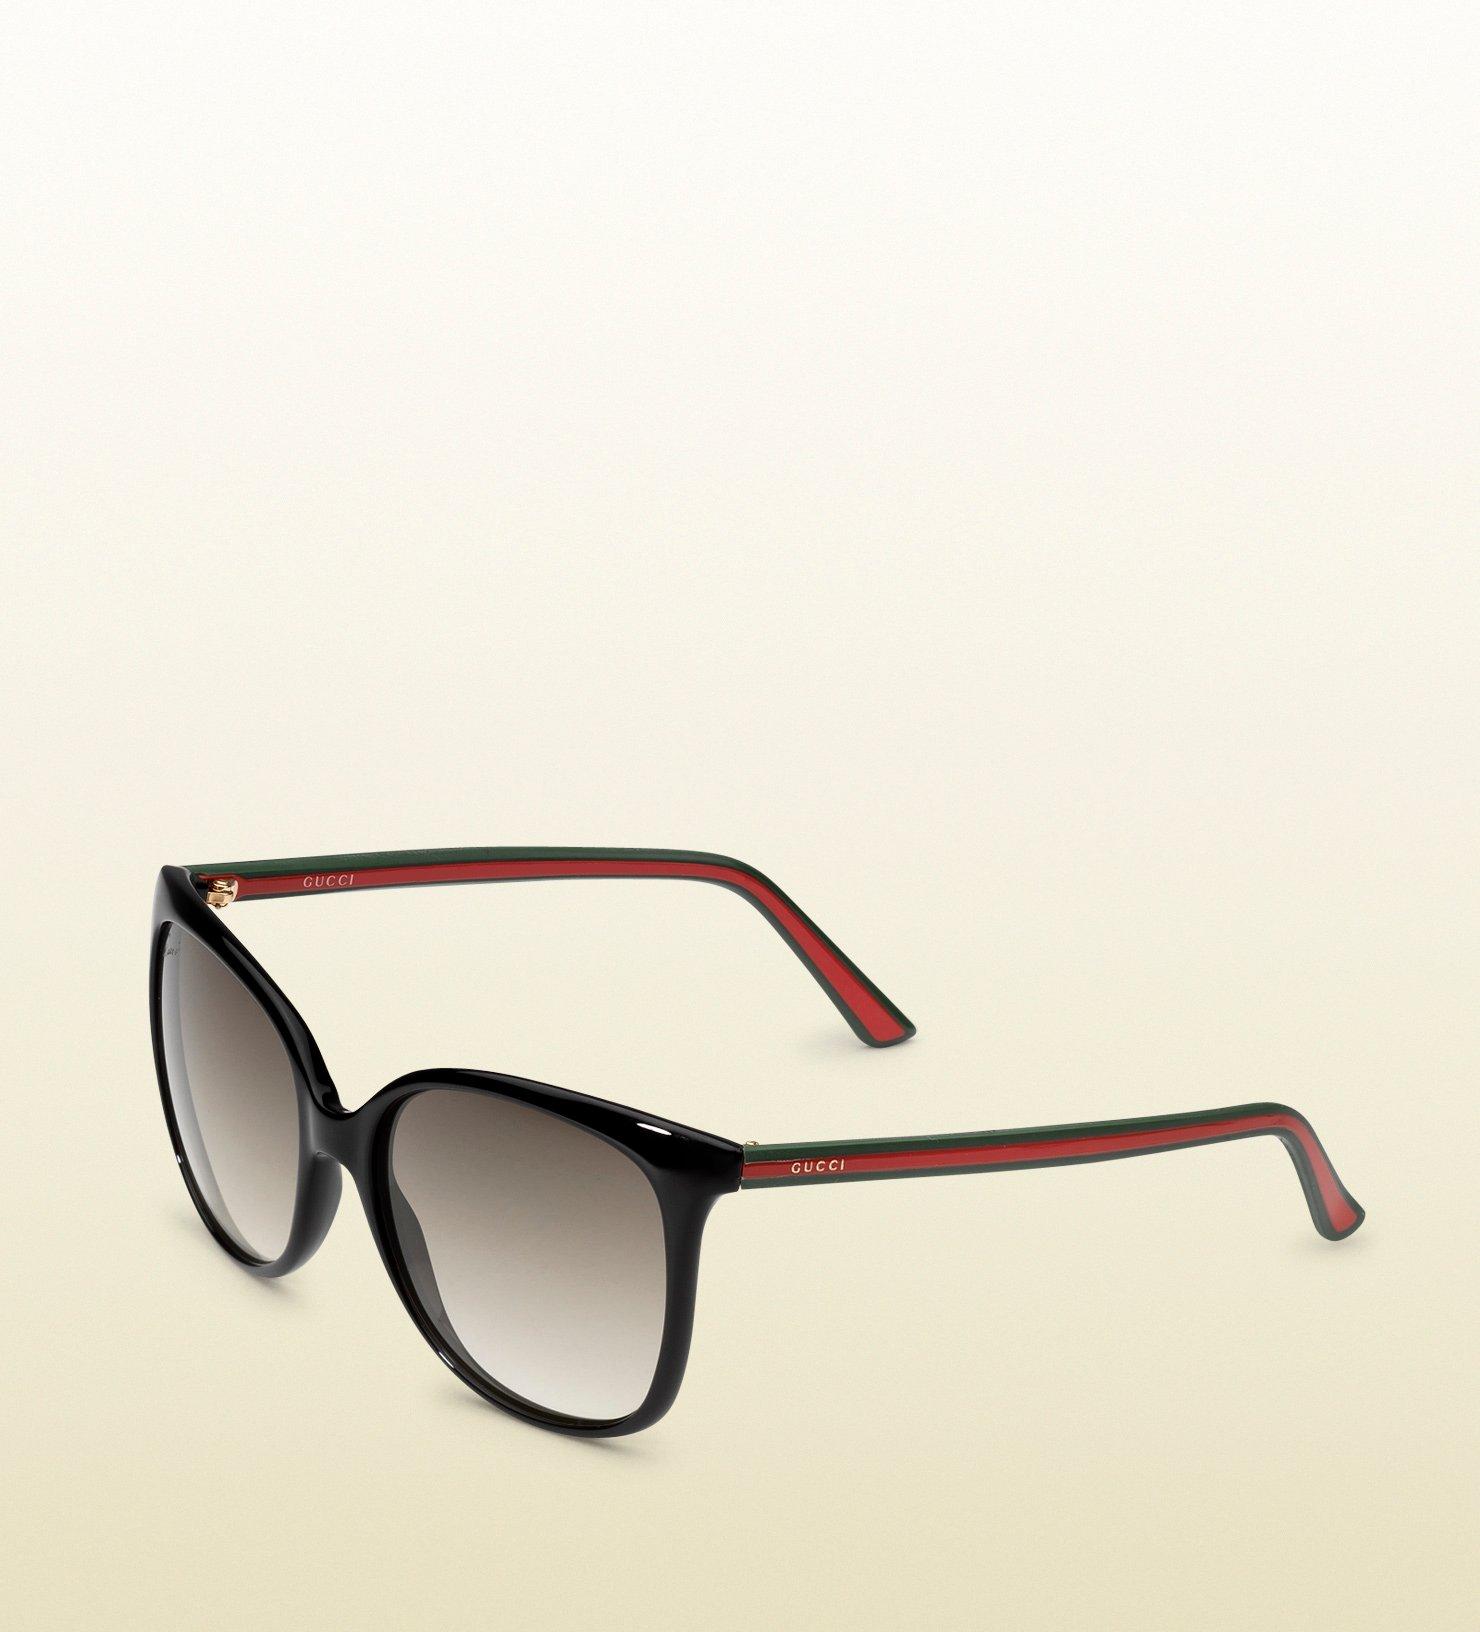 58ee403e69a Lyst - Gucci Rubber Effect Web Sunglasses in Black for Men